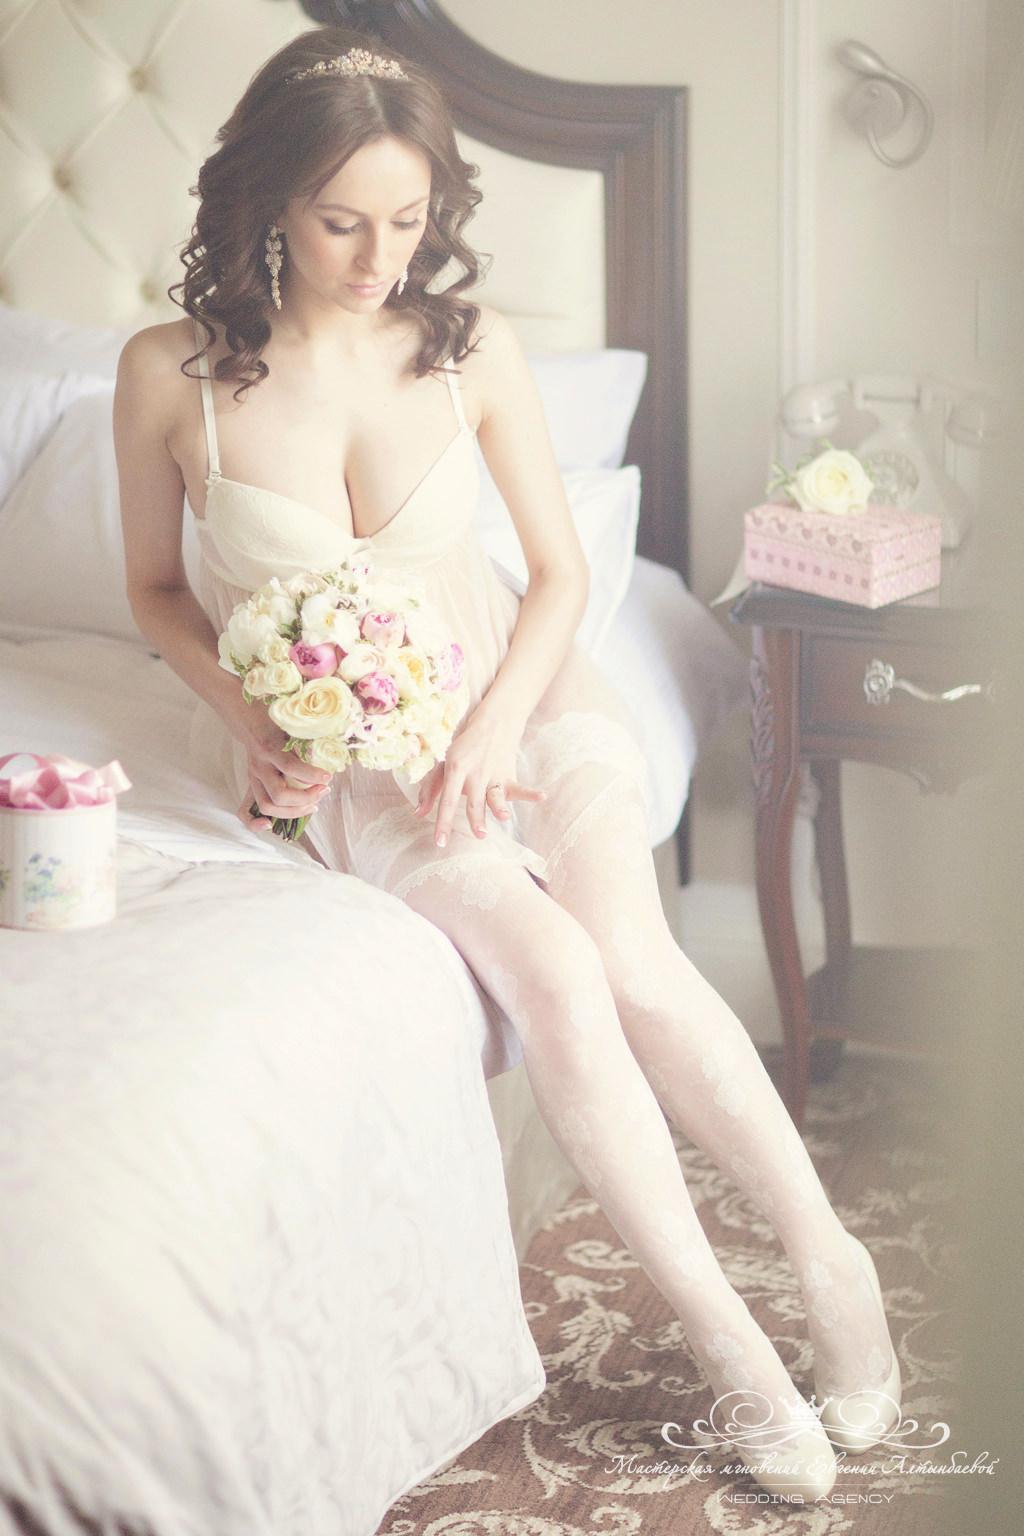 svadebnoe-ytro-nevesty